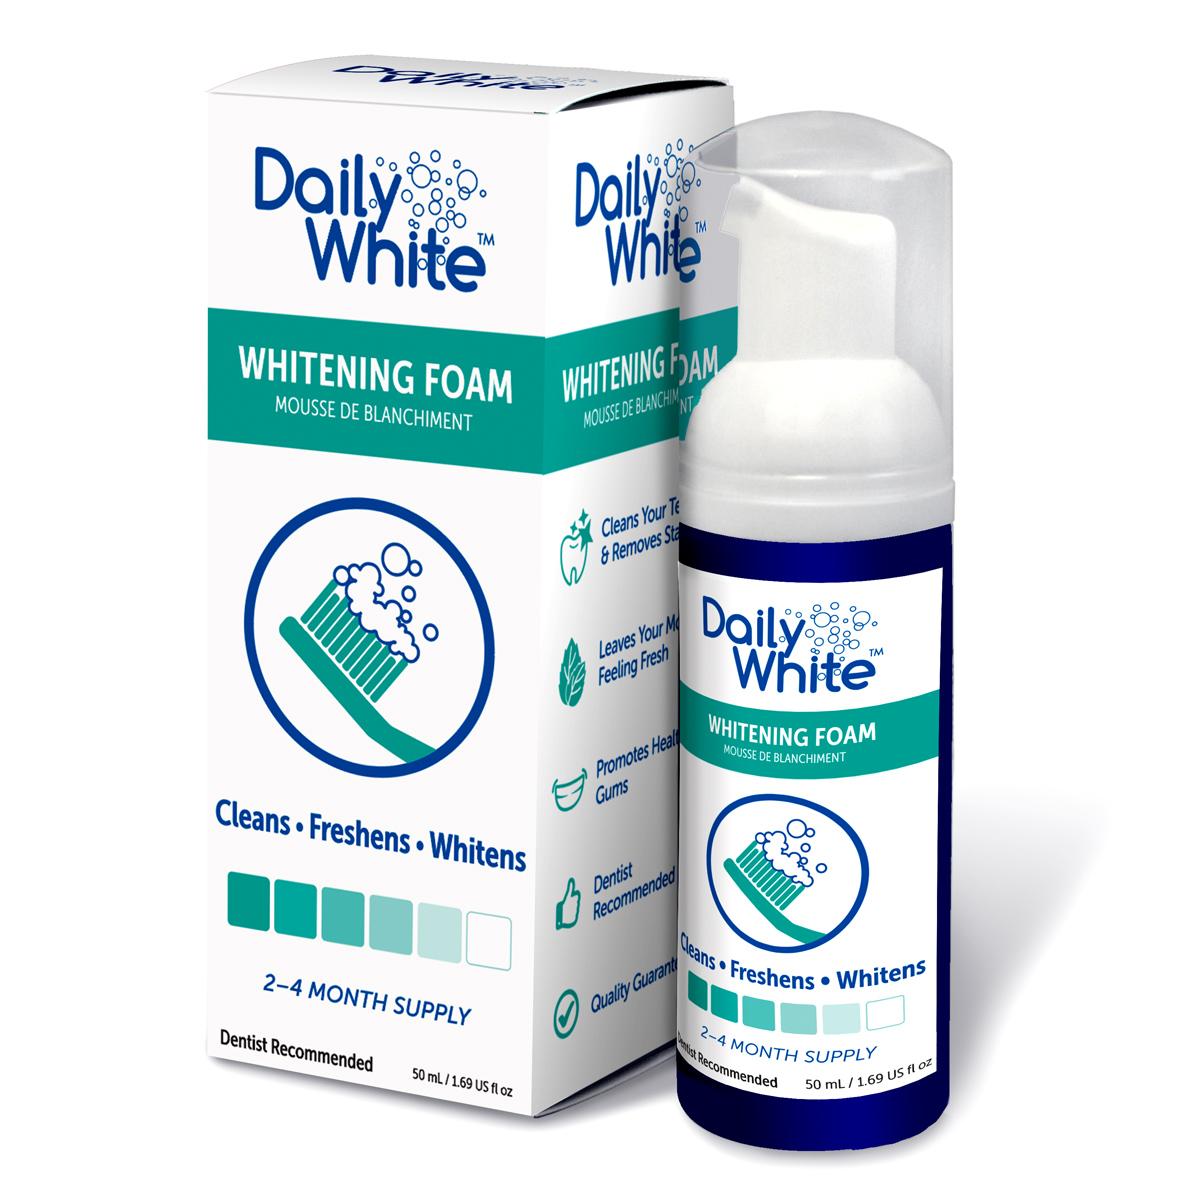 Daily White Fluoride Free Teeth Whitening Dental Foam